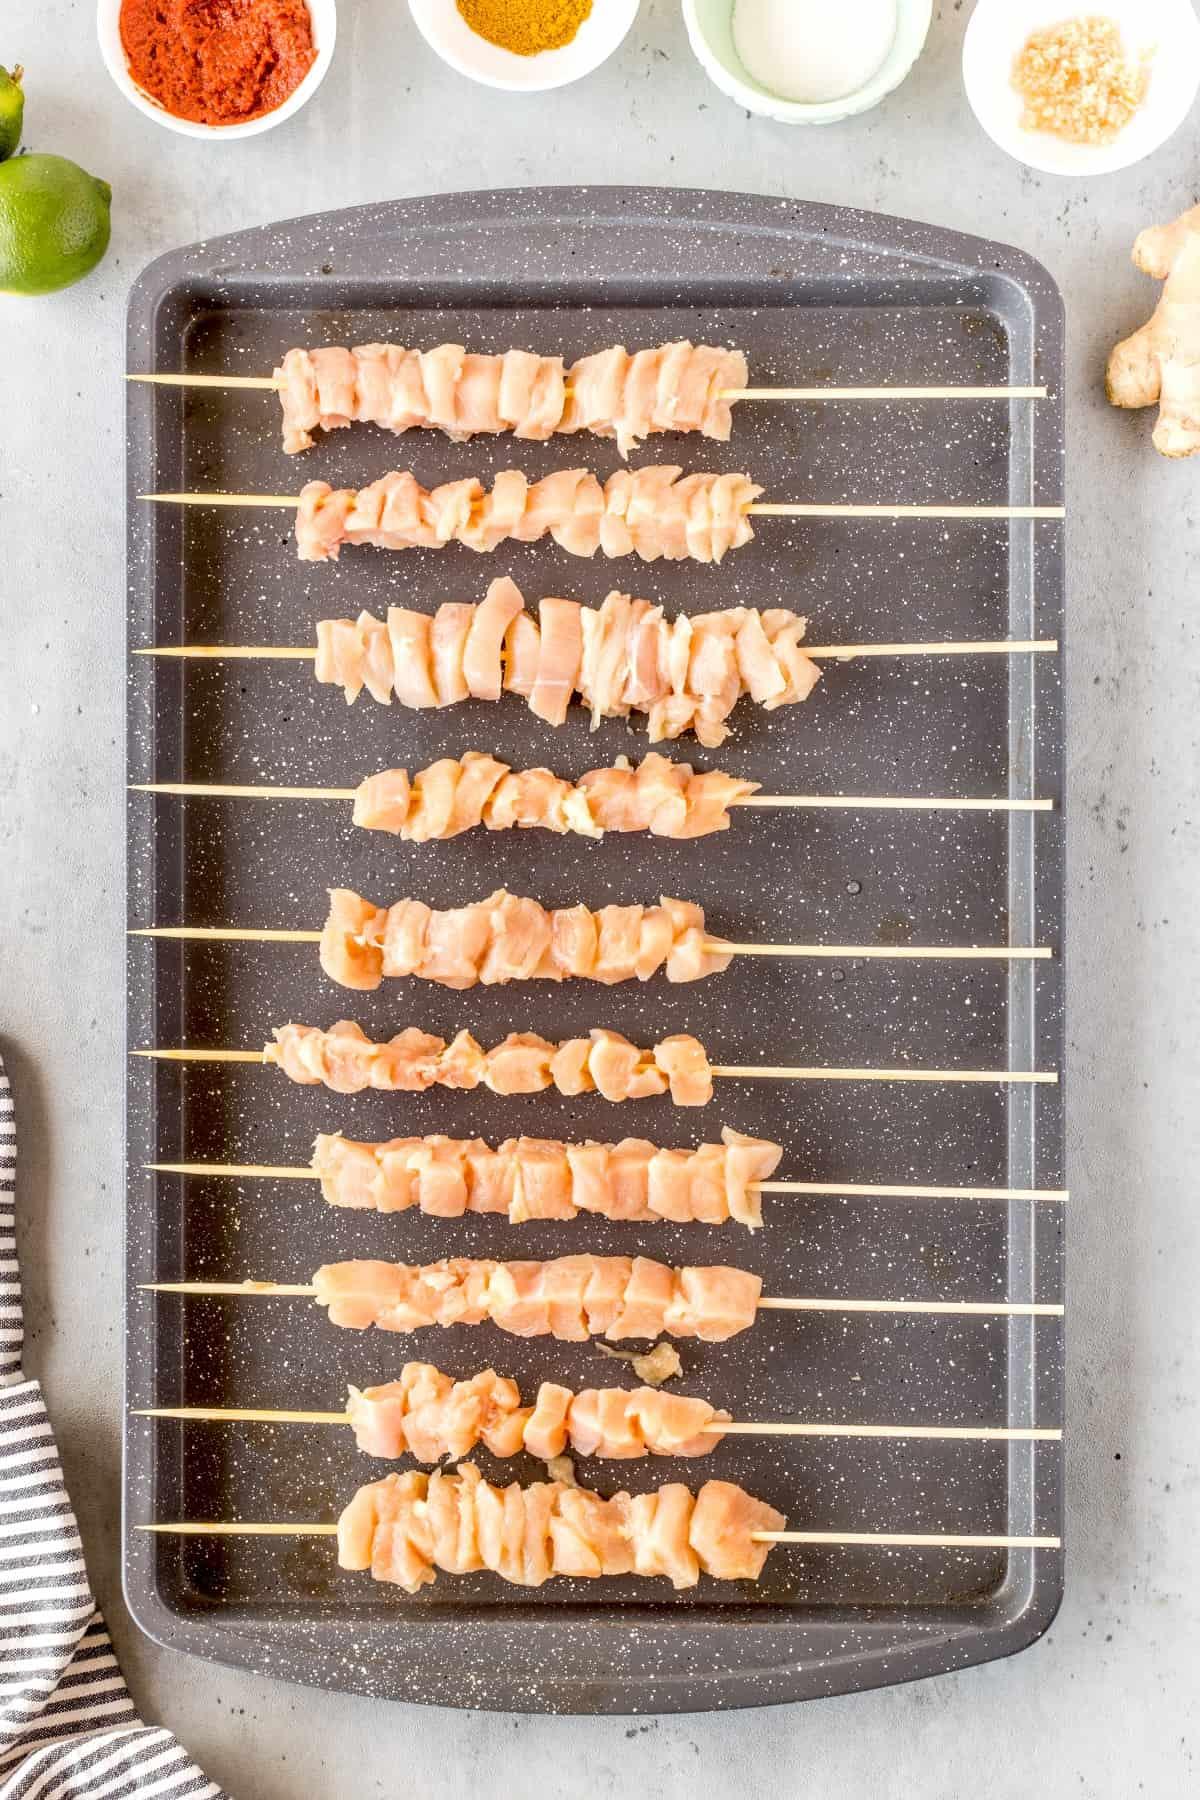 Chicken on skewers on a baking sheet